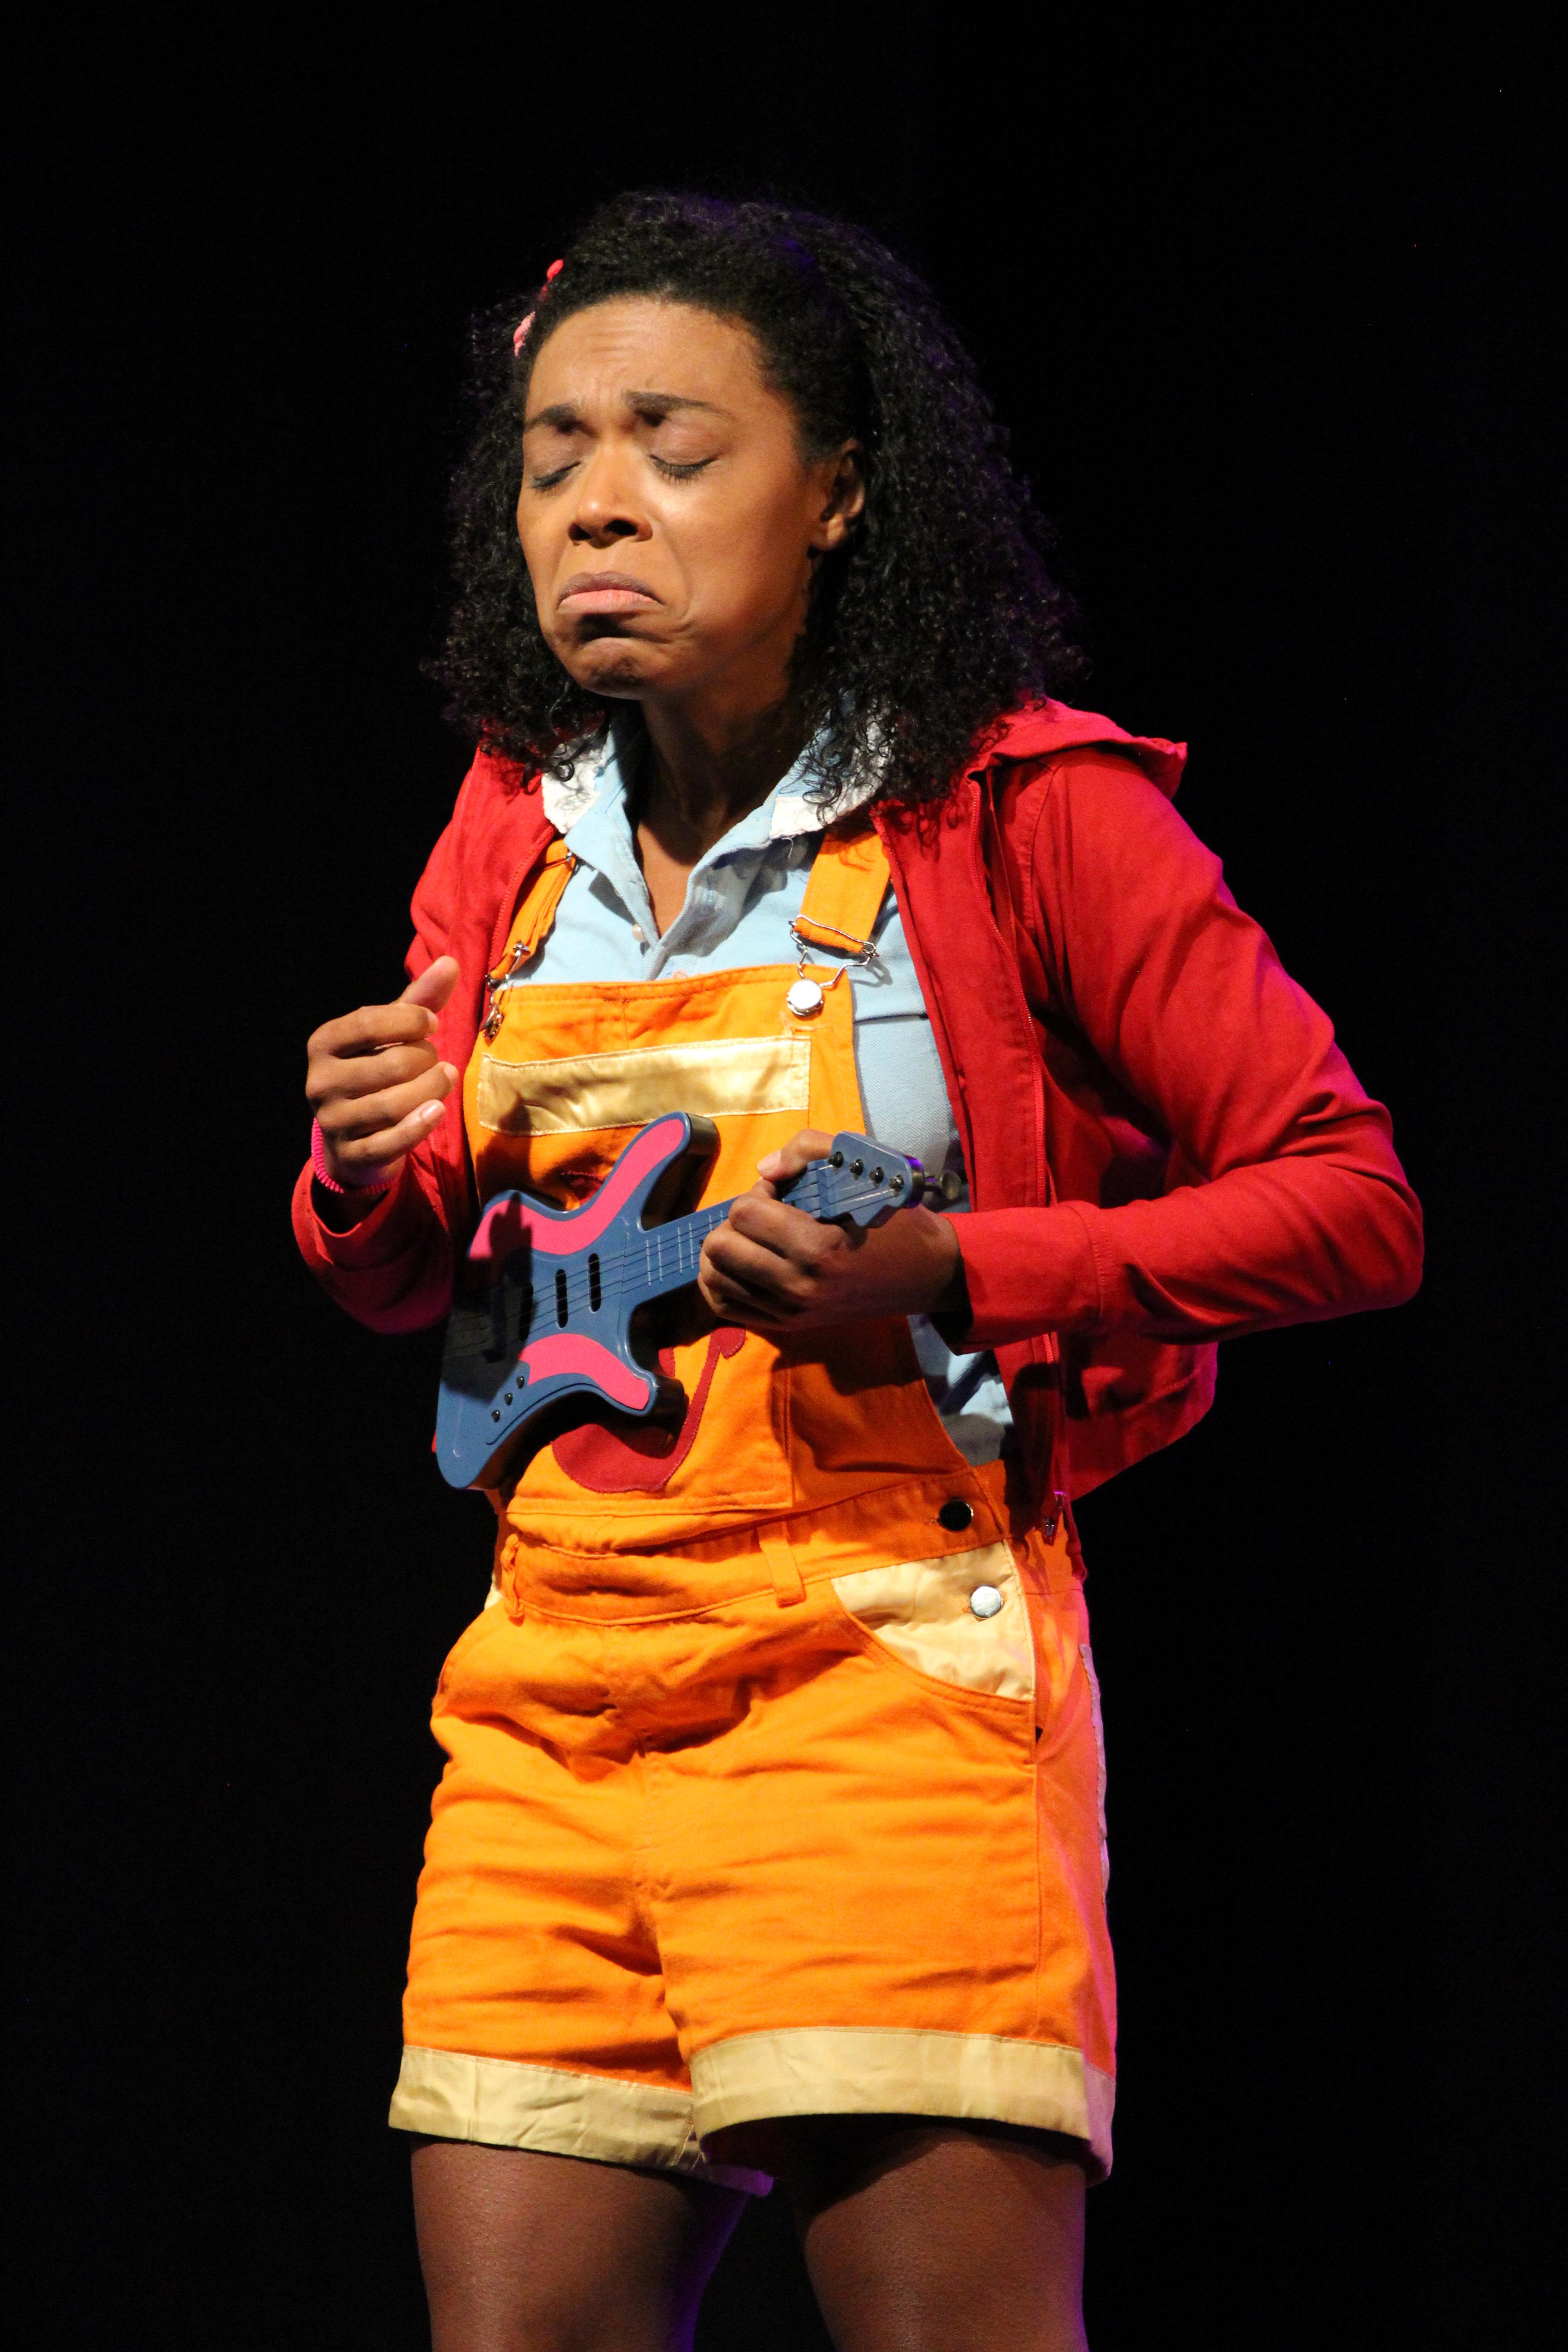 Atriz Vilma Melo interpreta criança na peça Marrom - Nem Preto Nem Branco?